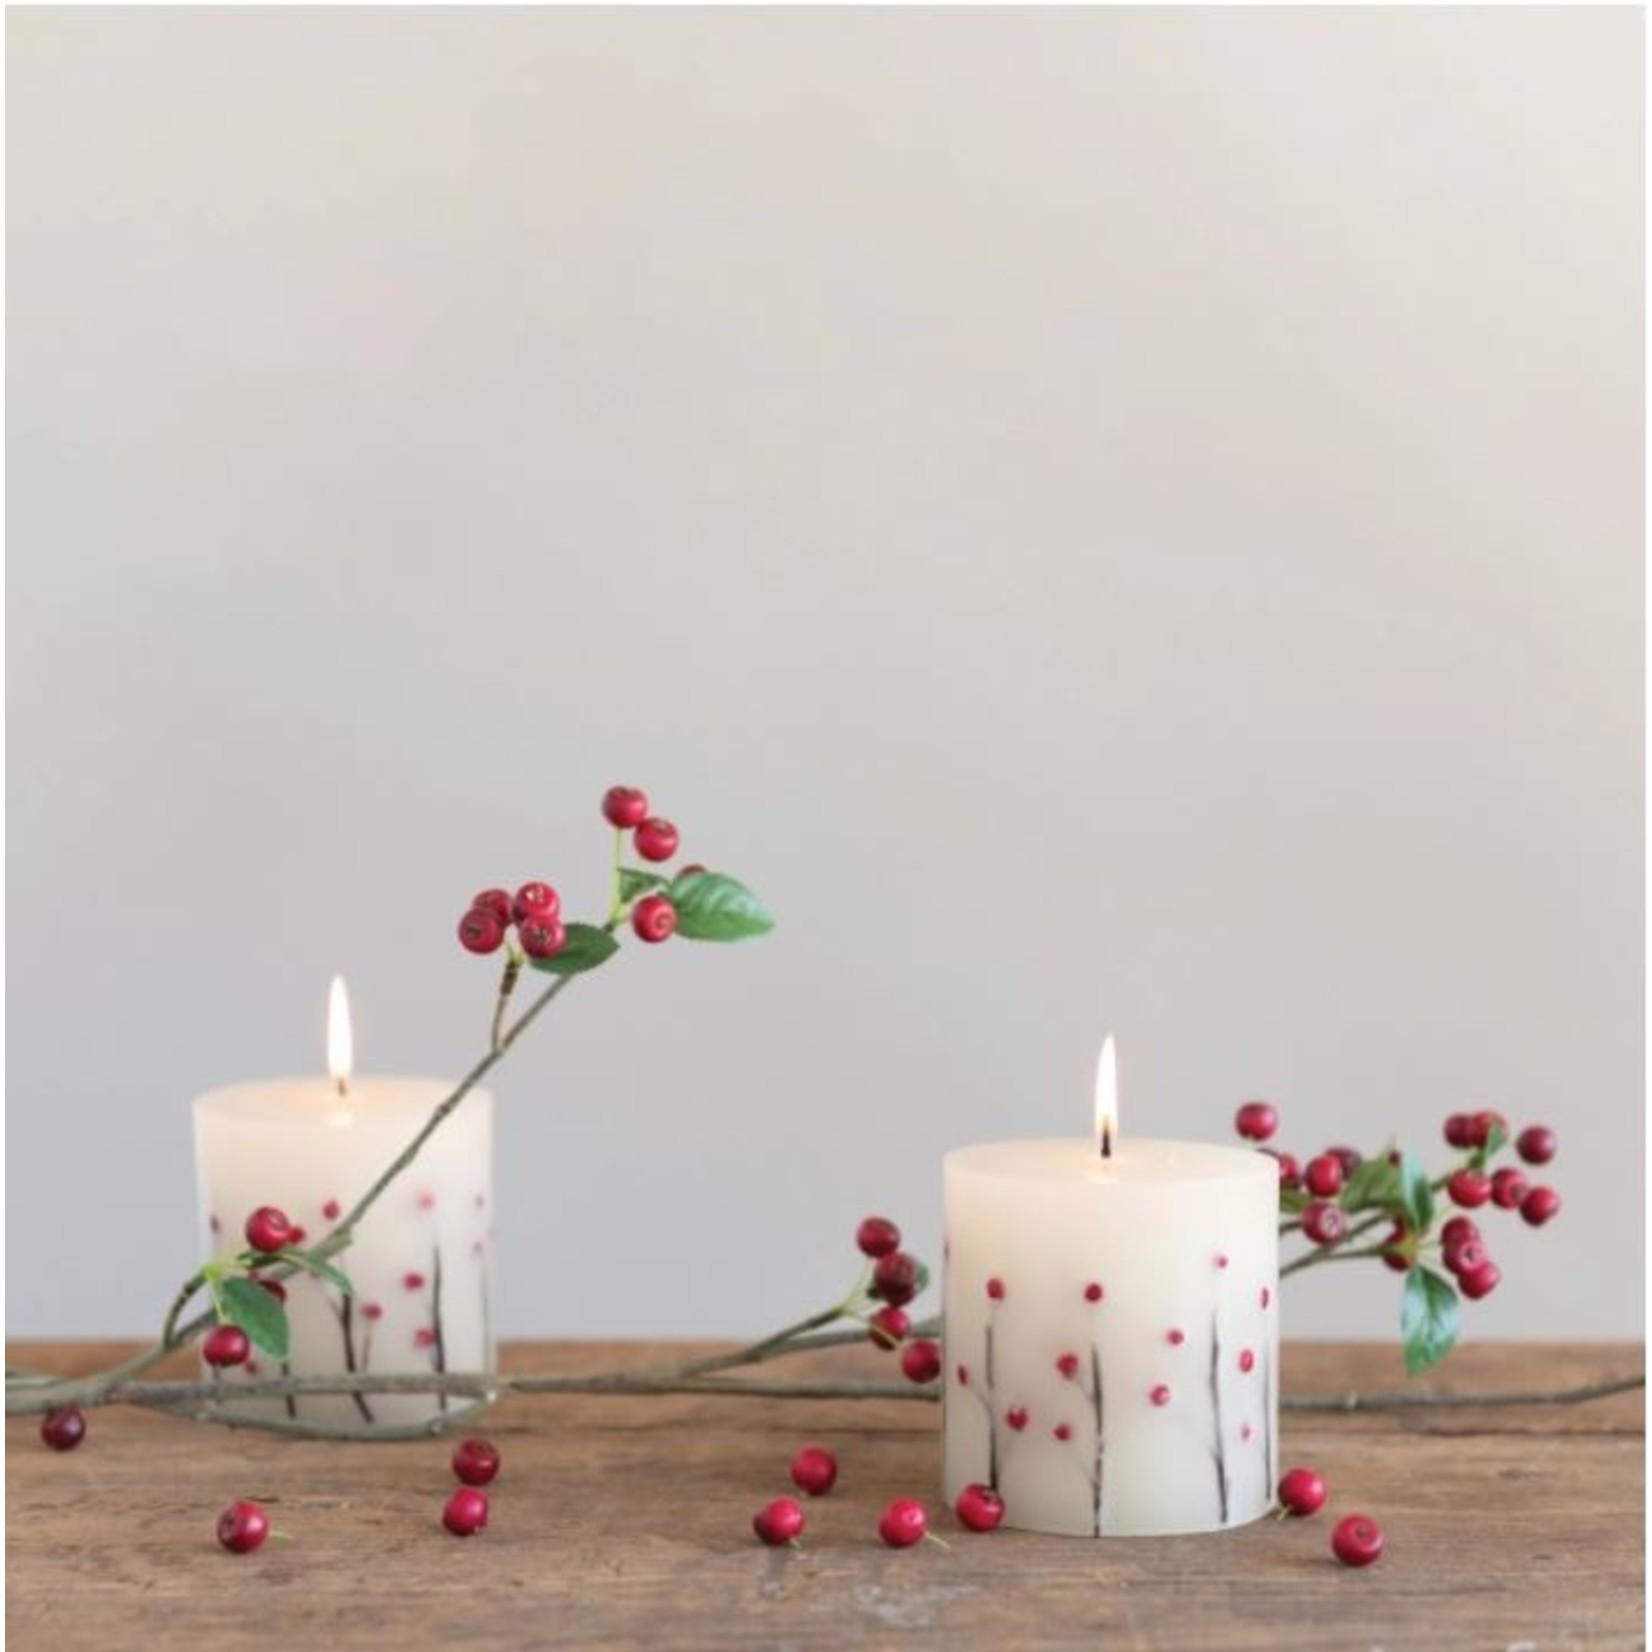 Berries & Cinnamon Candle - 4 x 4